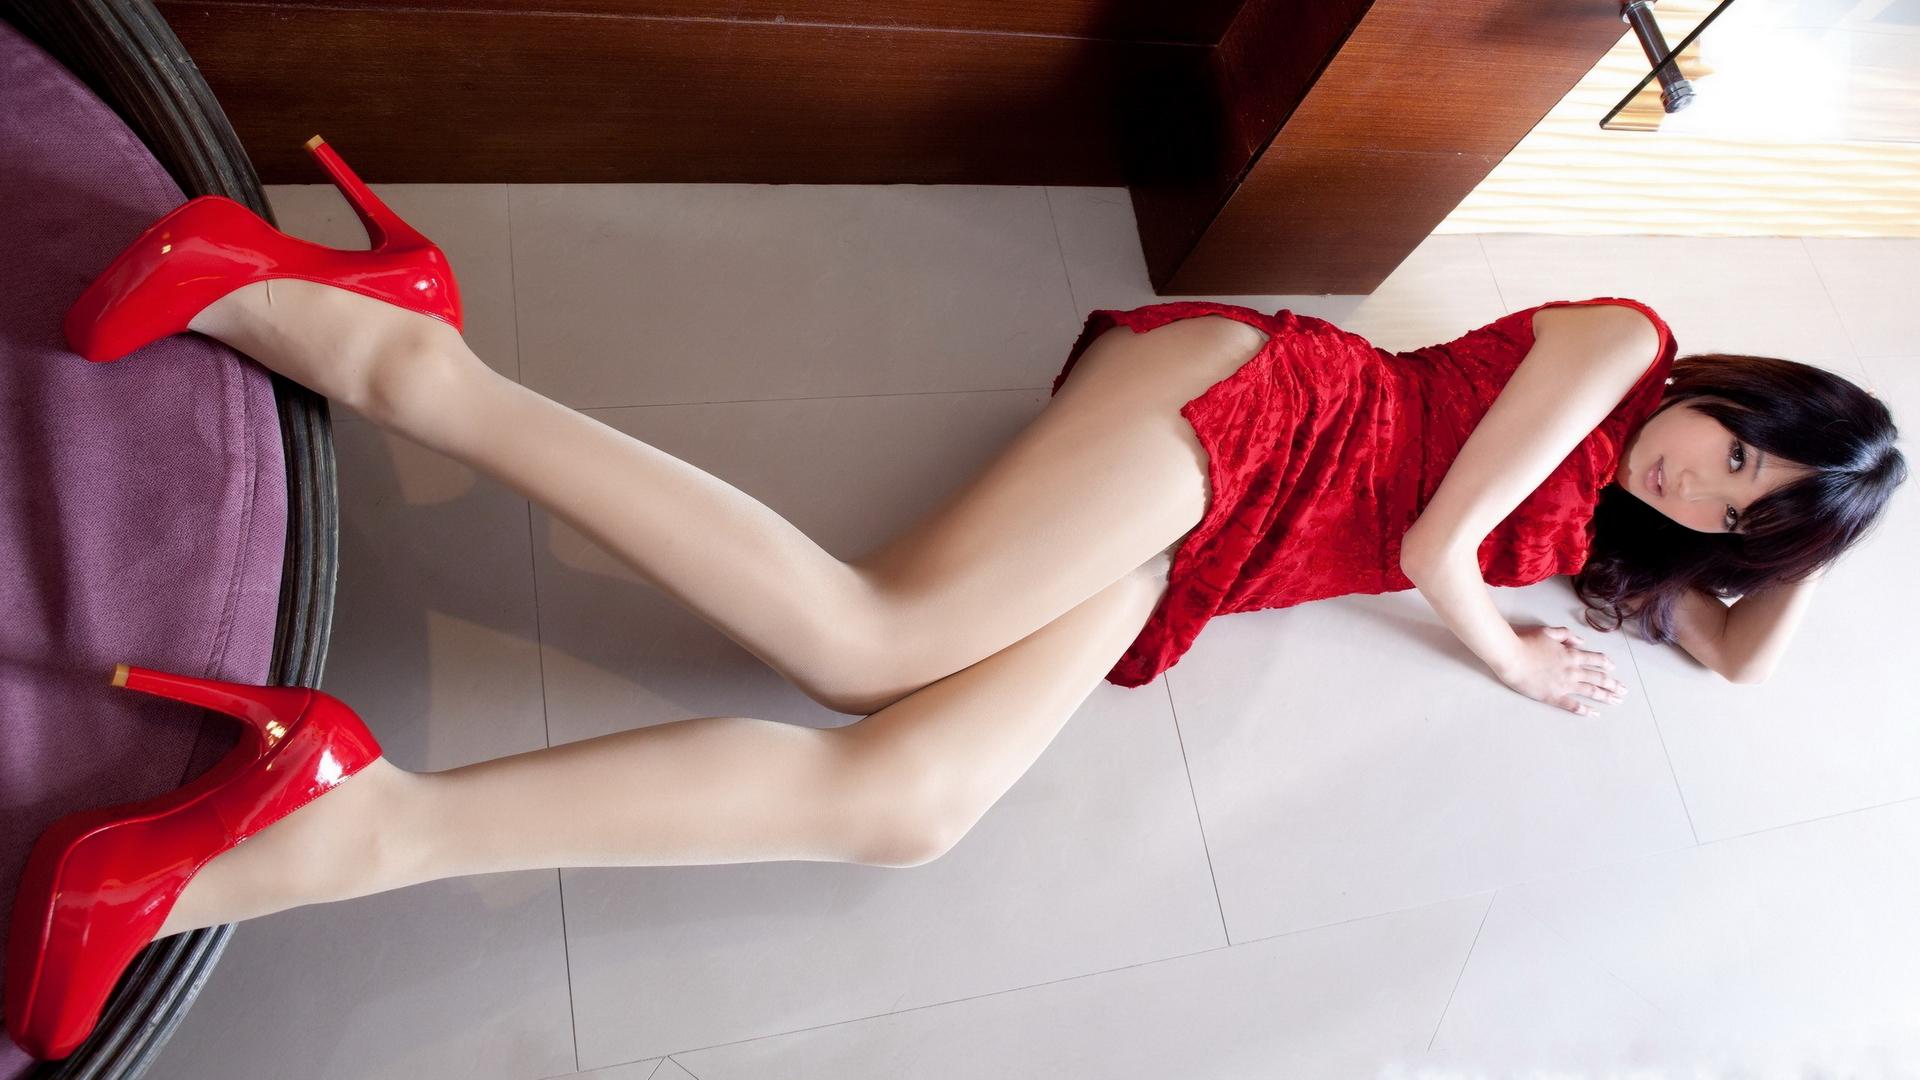 Sexy long legs beautiful asian woman stock photo